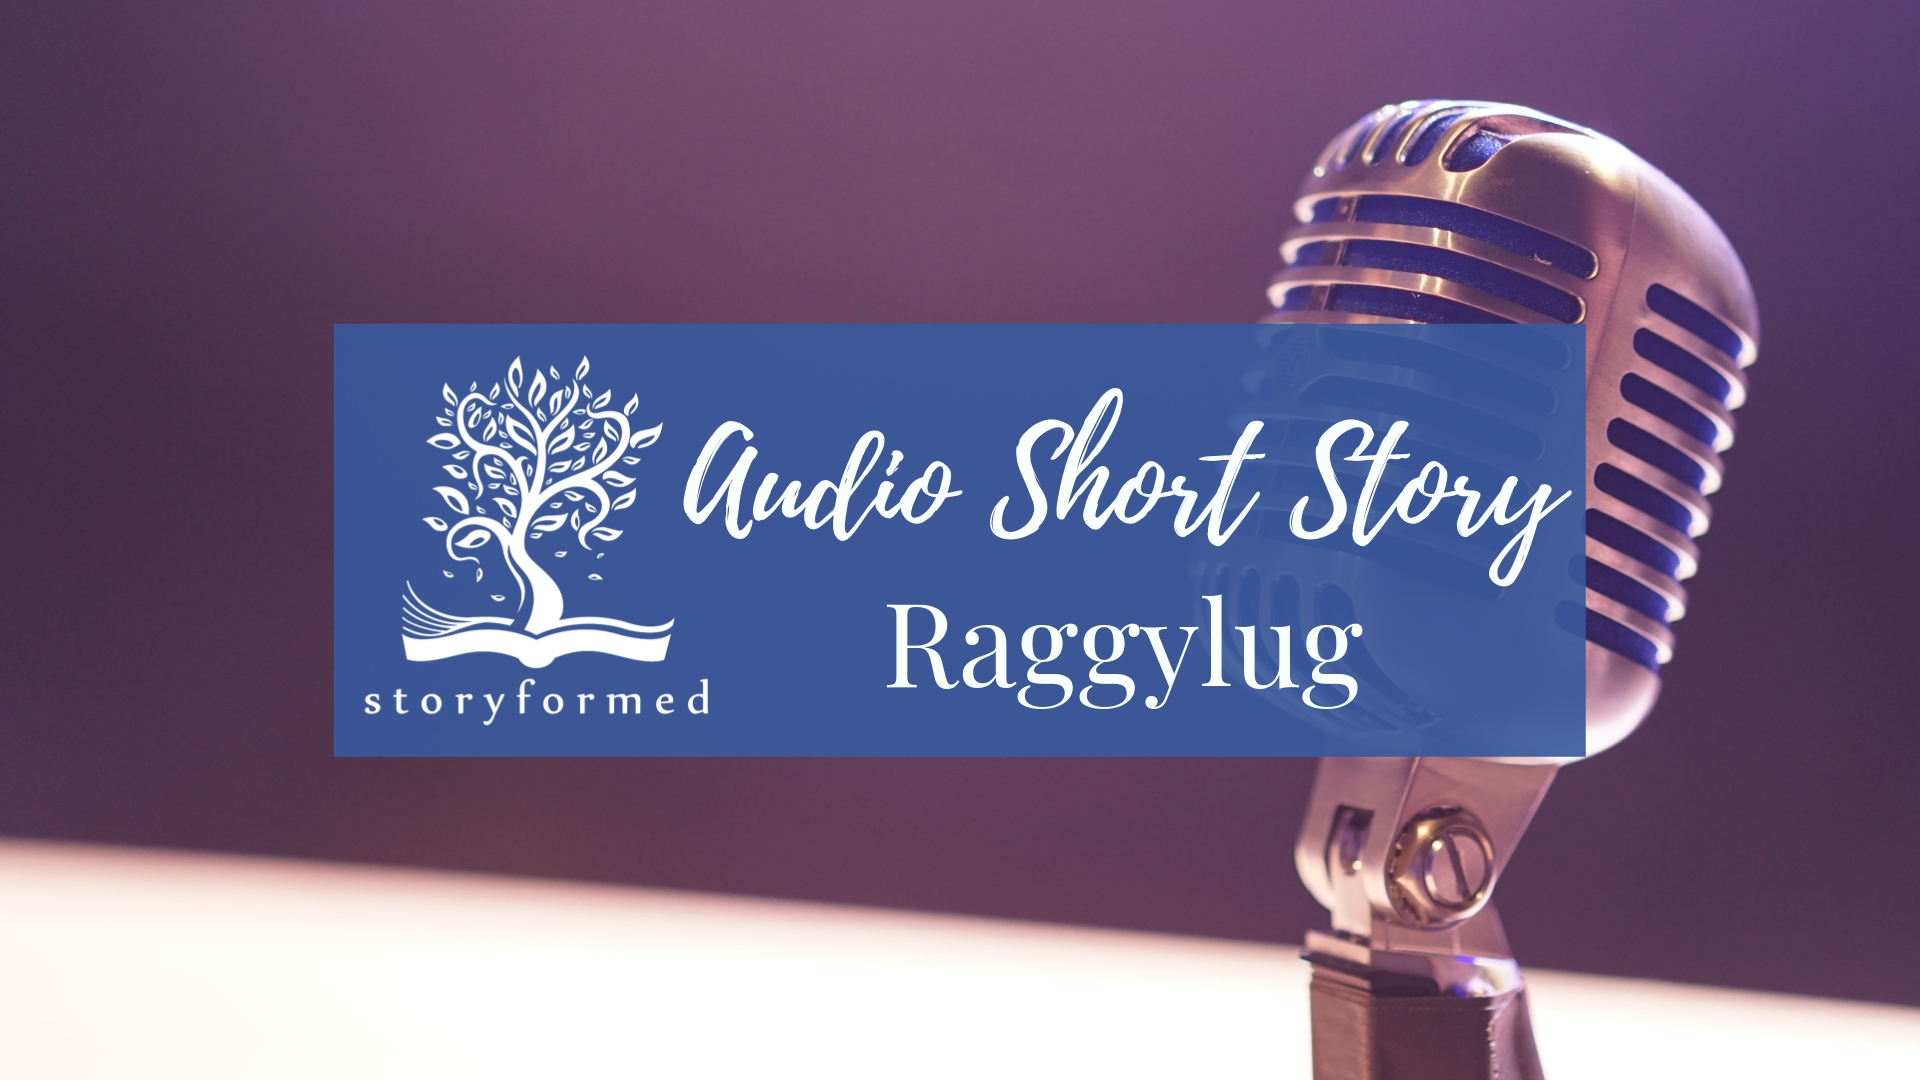 LWS Storyformed Audio Short Story Raggylug.jpg